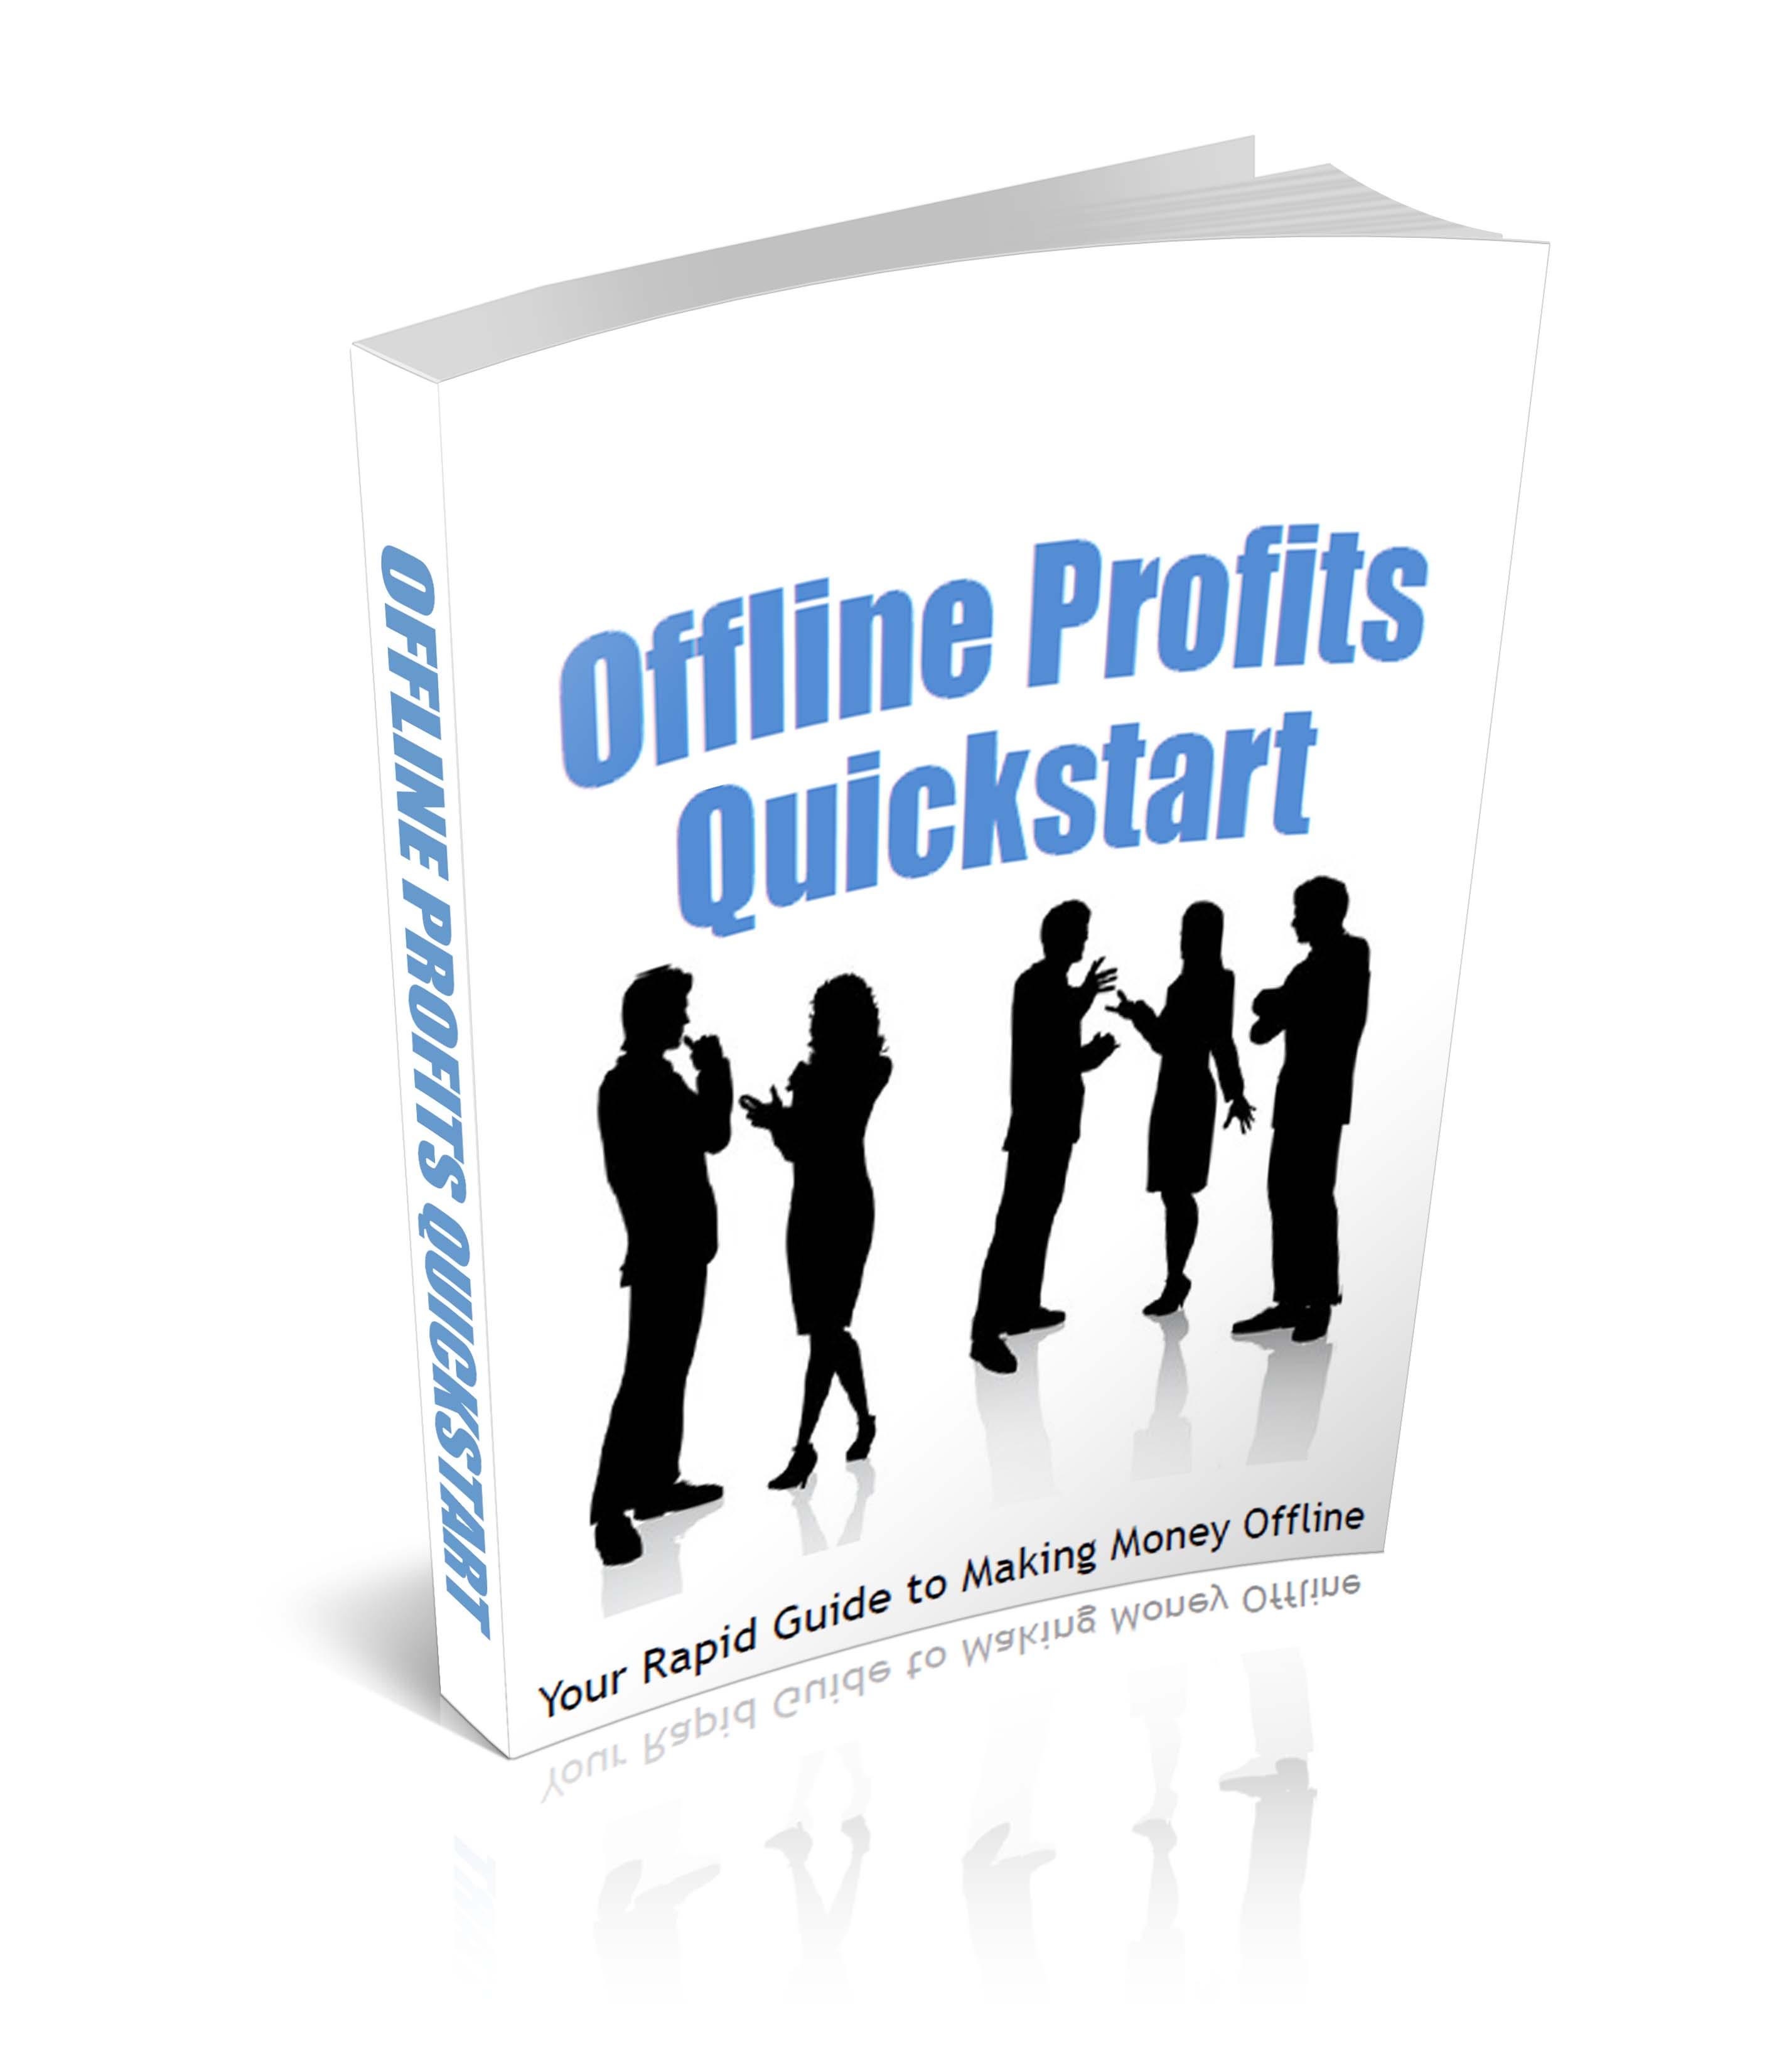 PLR MOffline Profits Quickstart